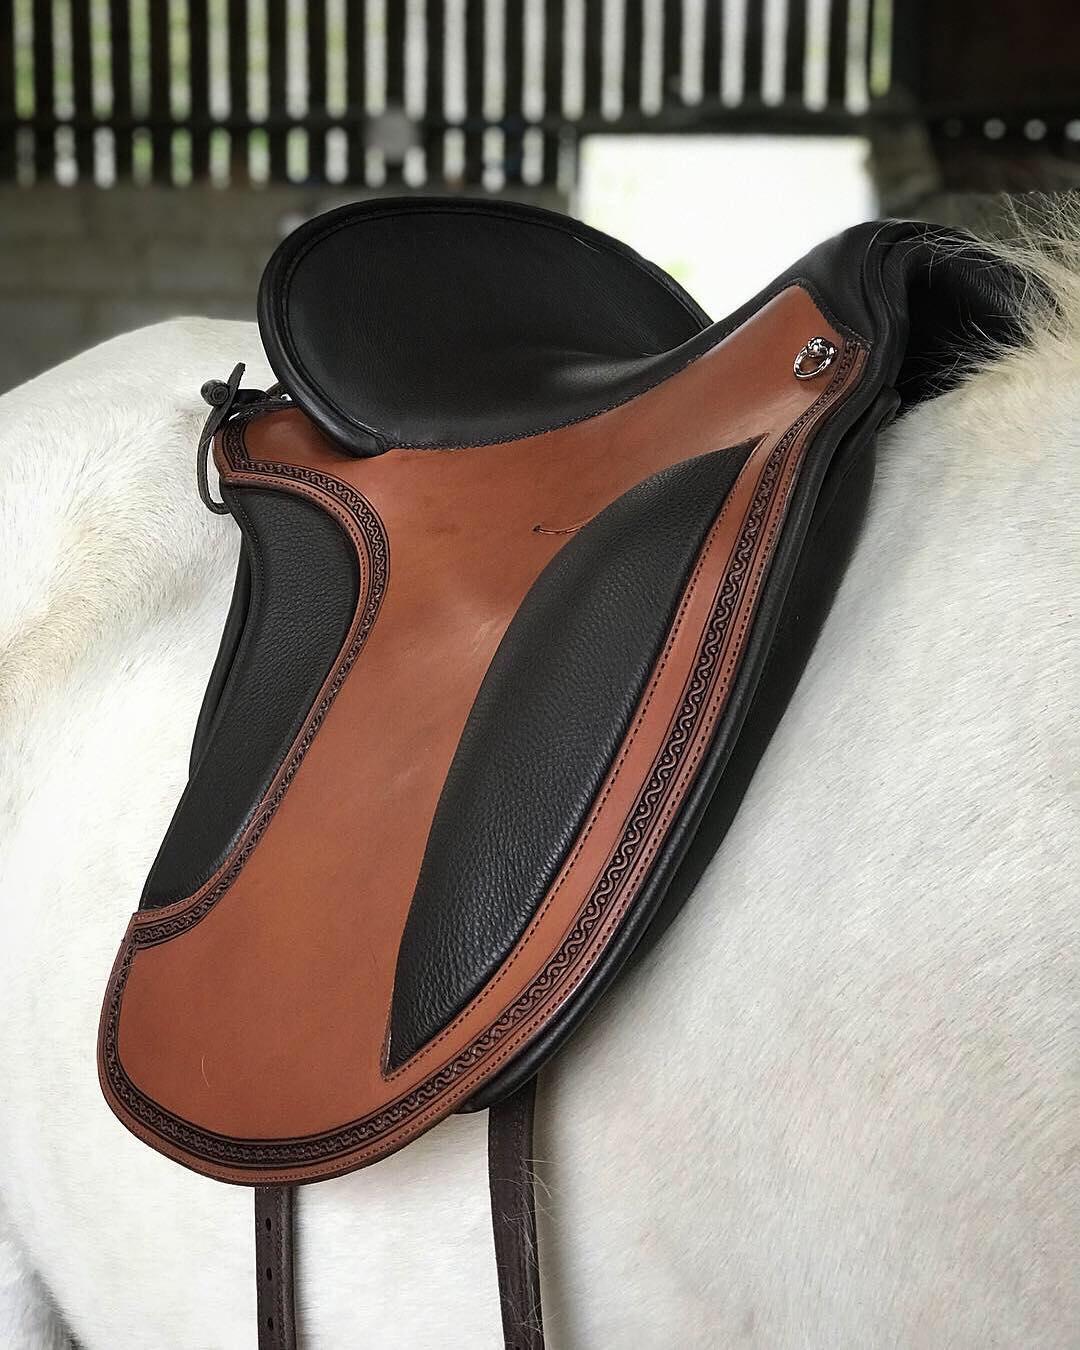 Impuls Deuber & Partner Saddle